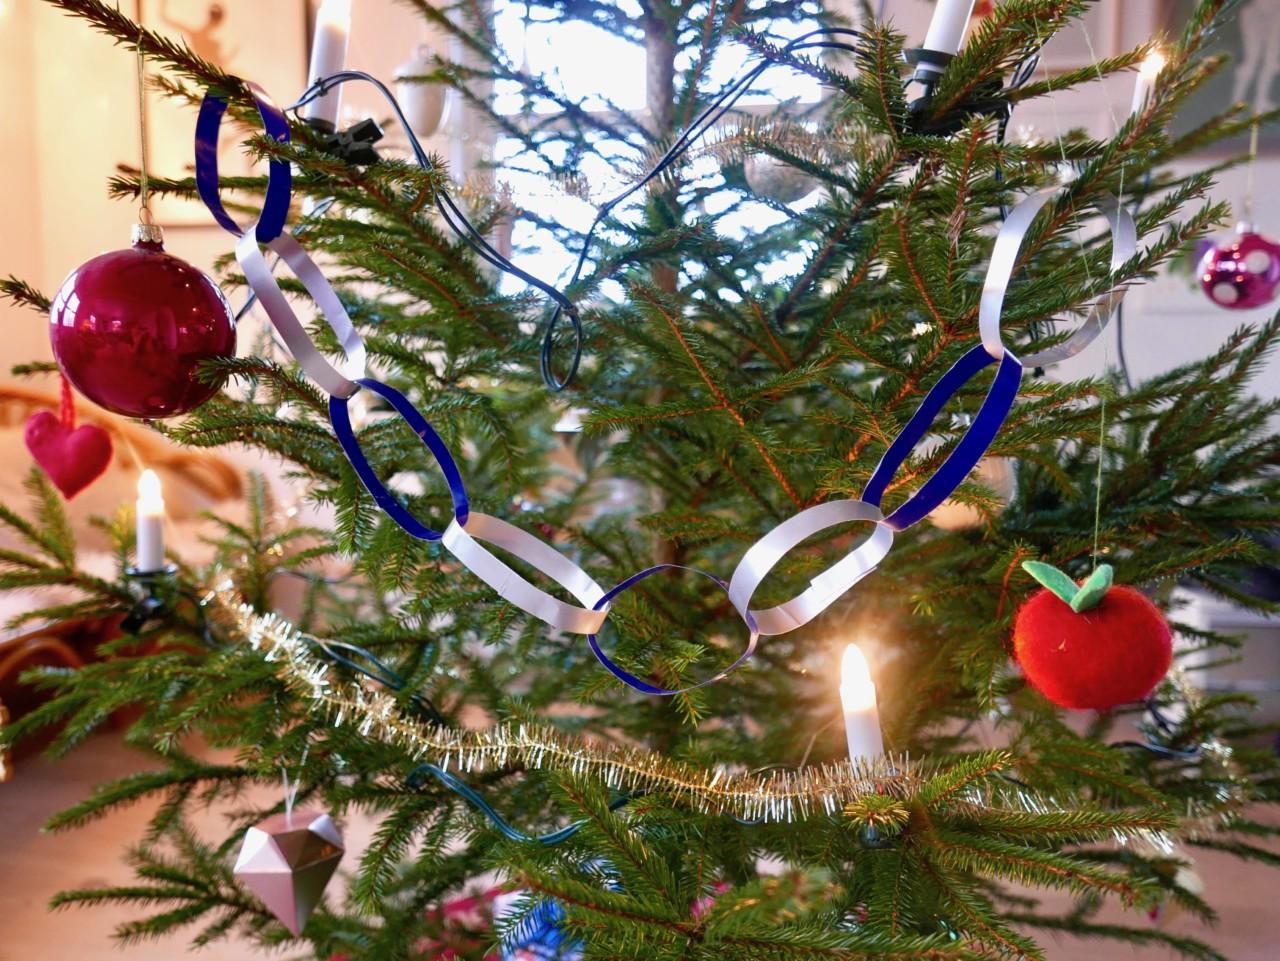 juletre-eple-pynt-lille-julaften-anja-stang